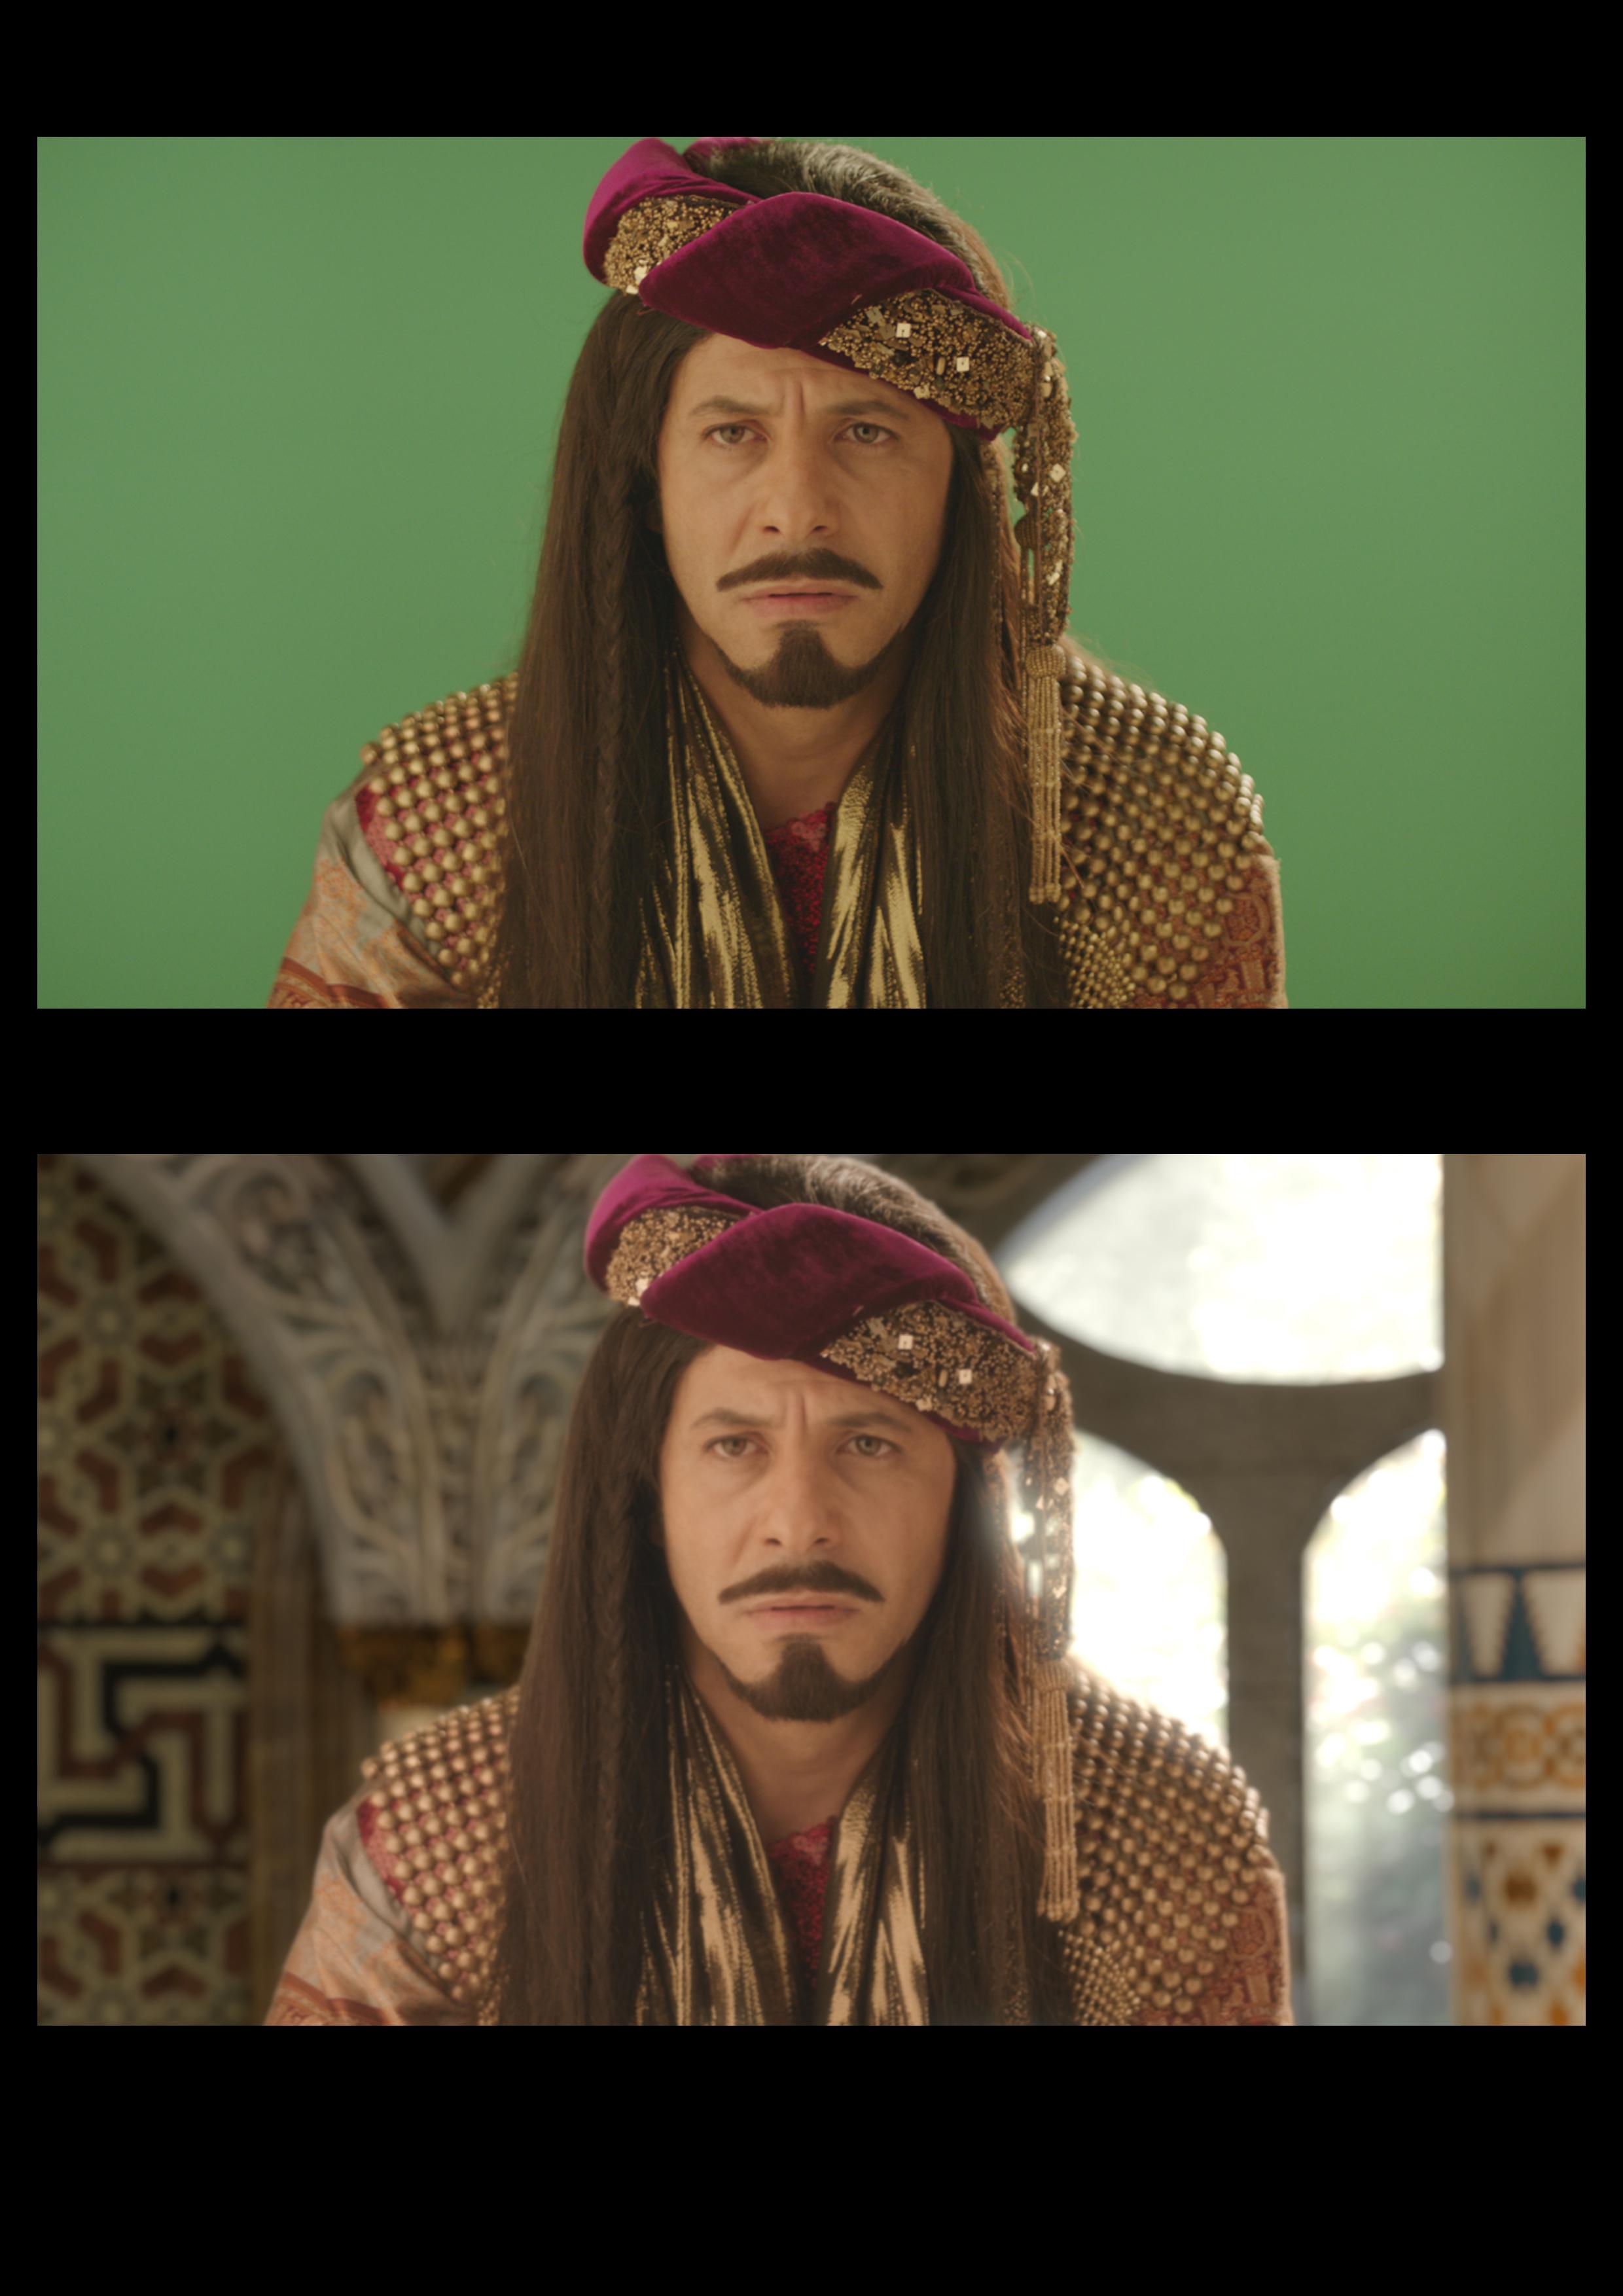 1001 Arabian Nights TV series